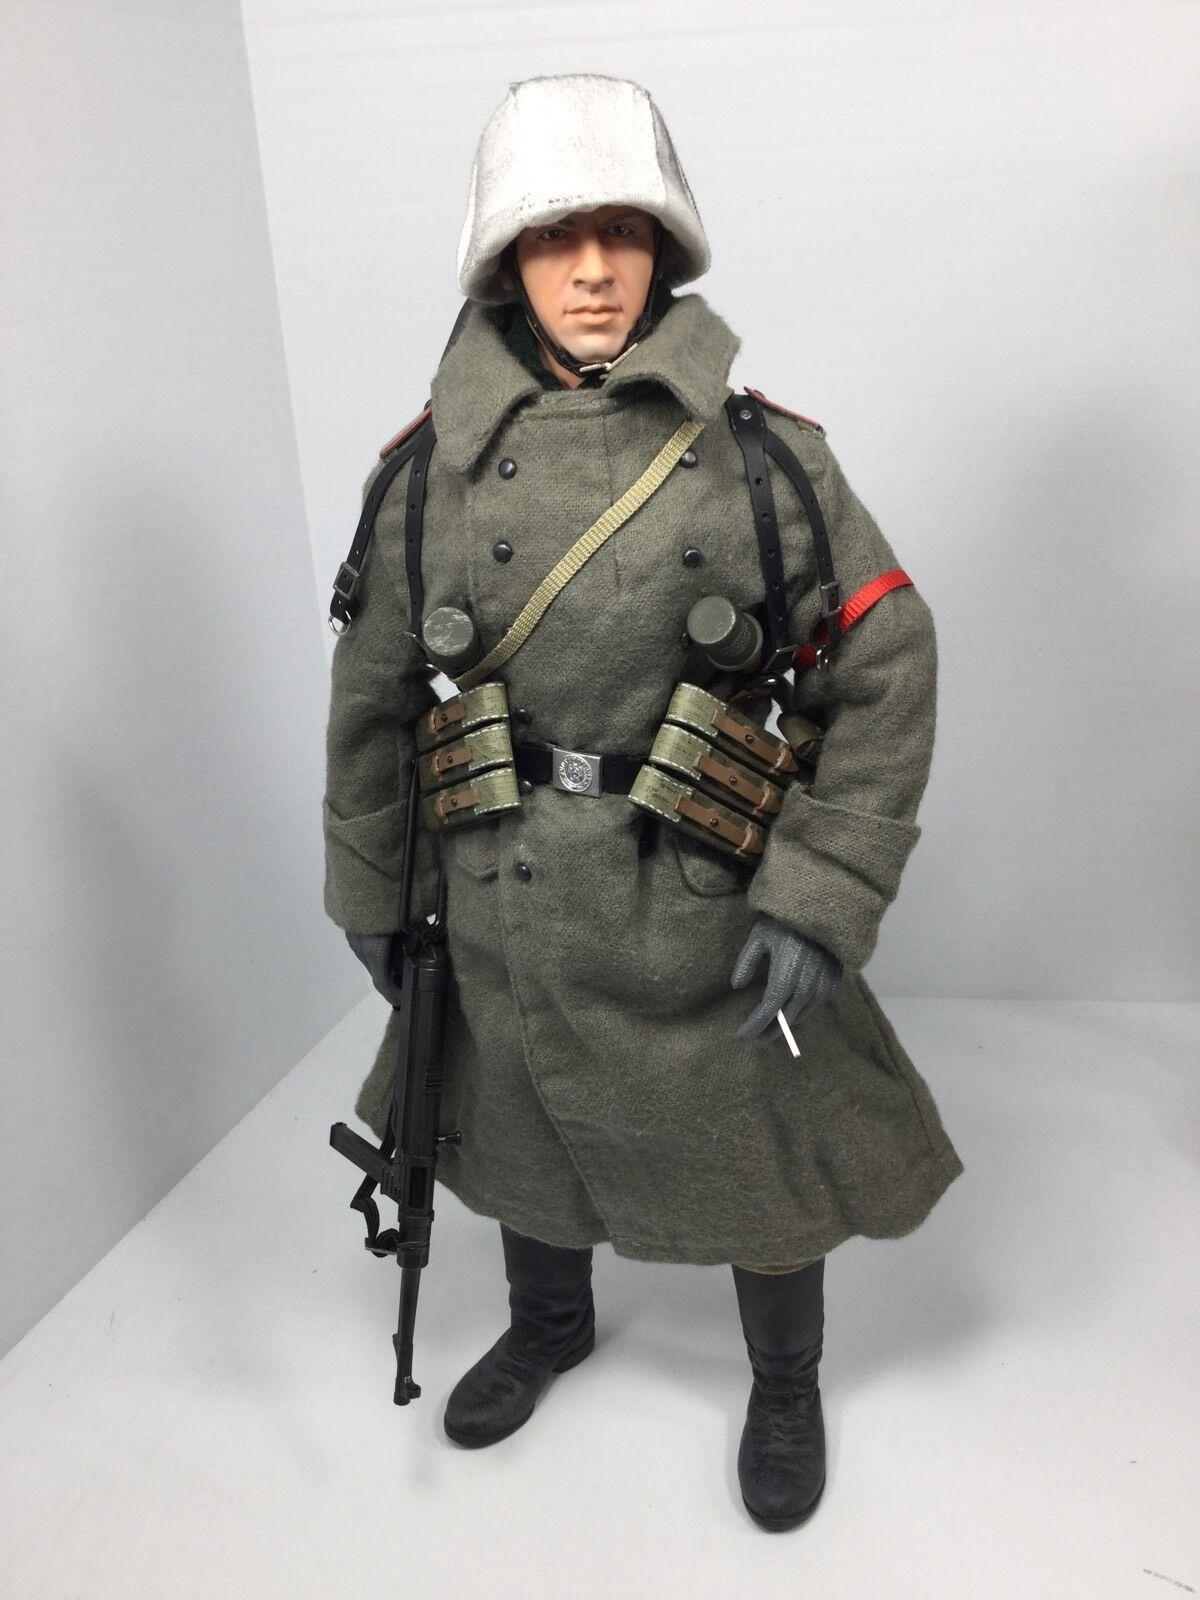 16 DRAGON GERuomo WEHRMACHT 6TH ARMY STALINGRAD MP40 WINTER GEAR BBI DID WW2